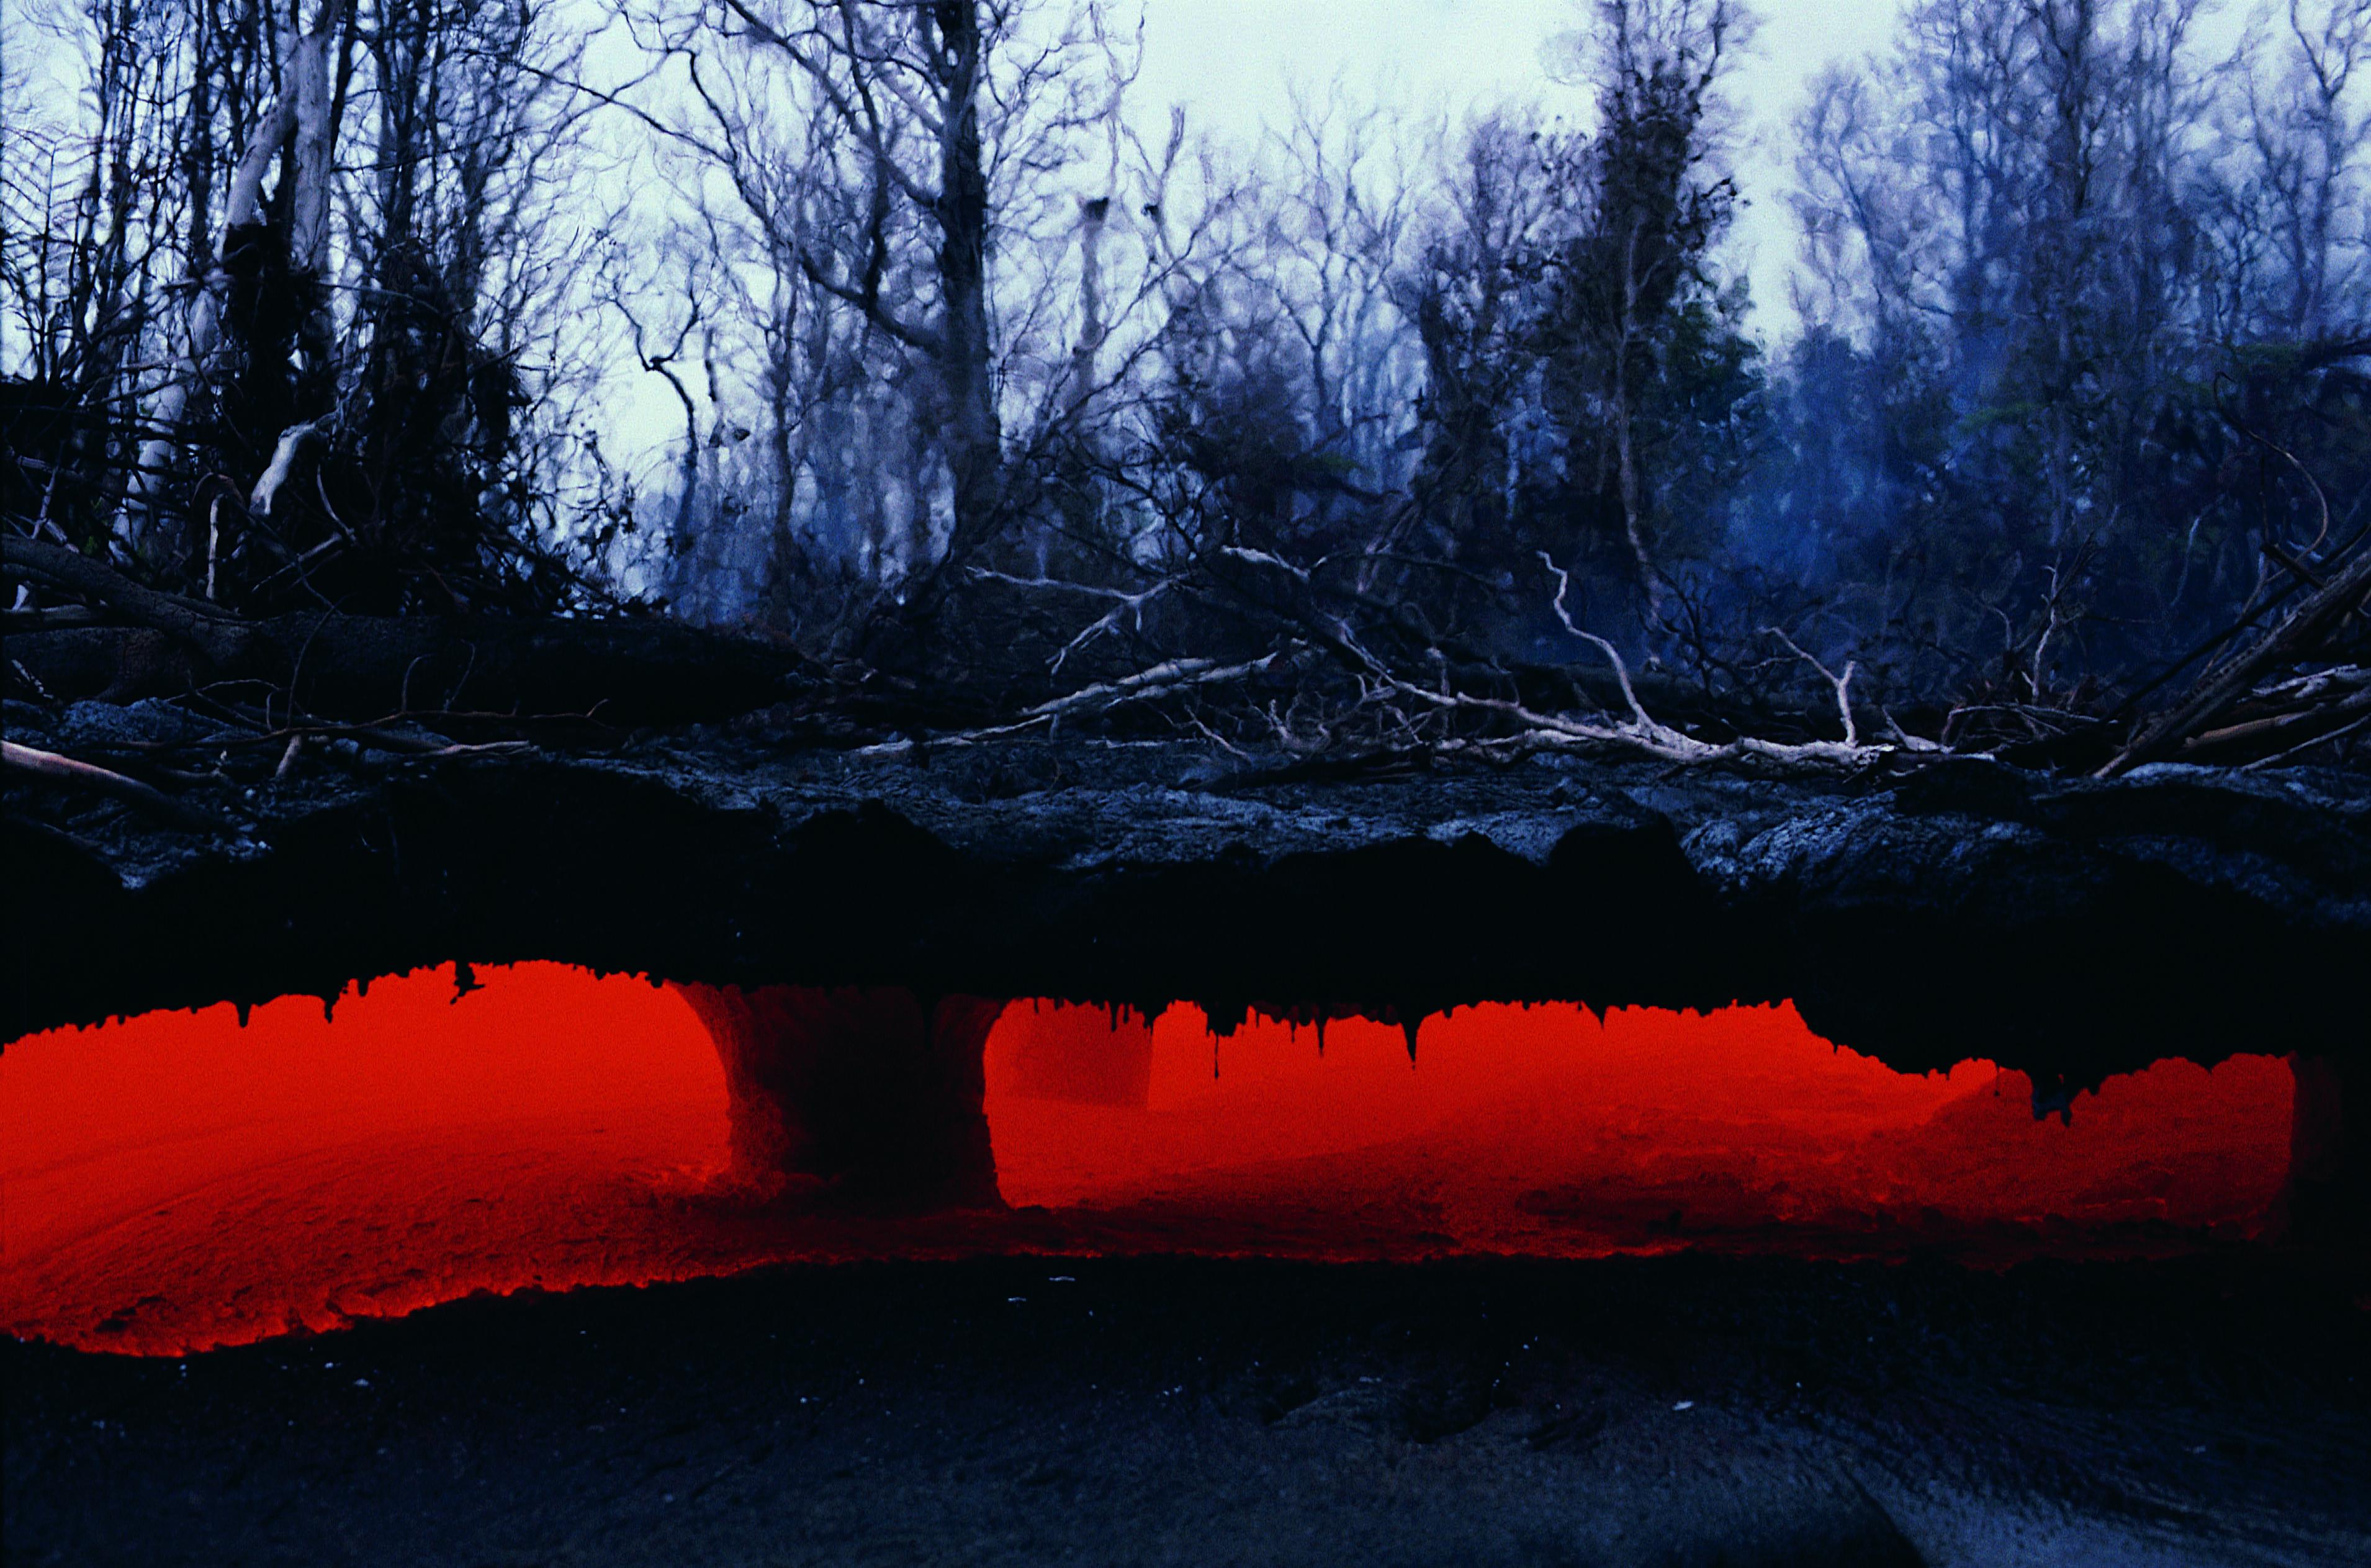 Underground river of magma